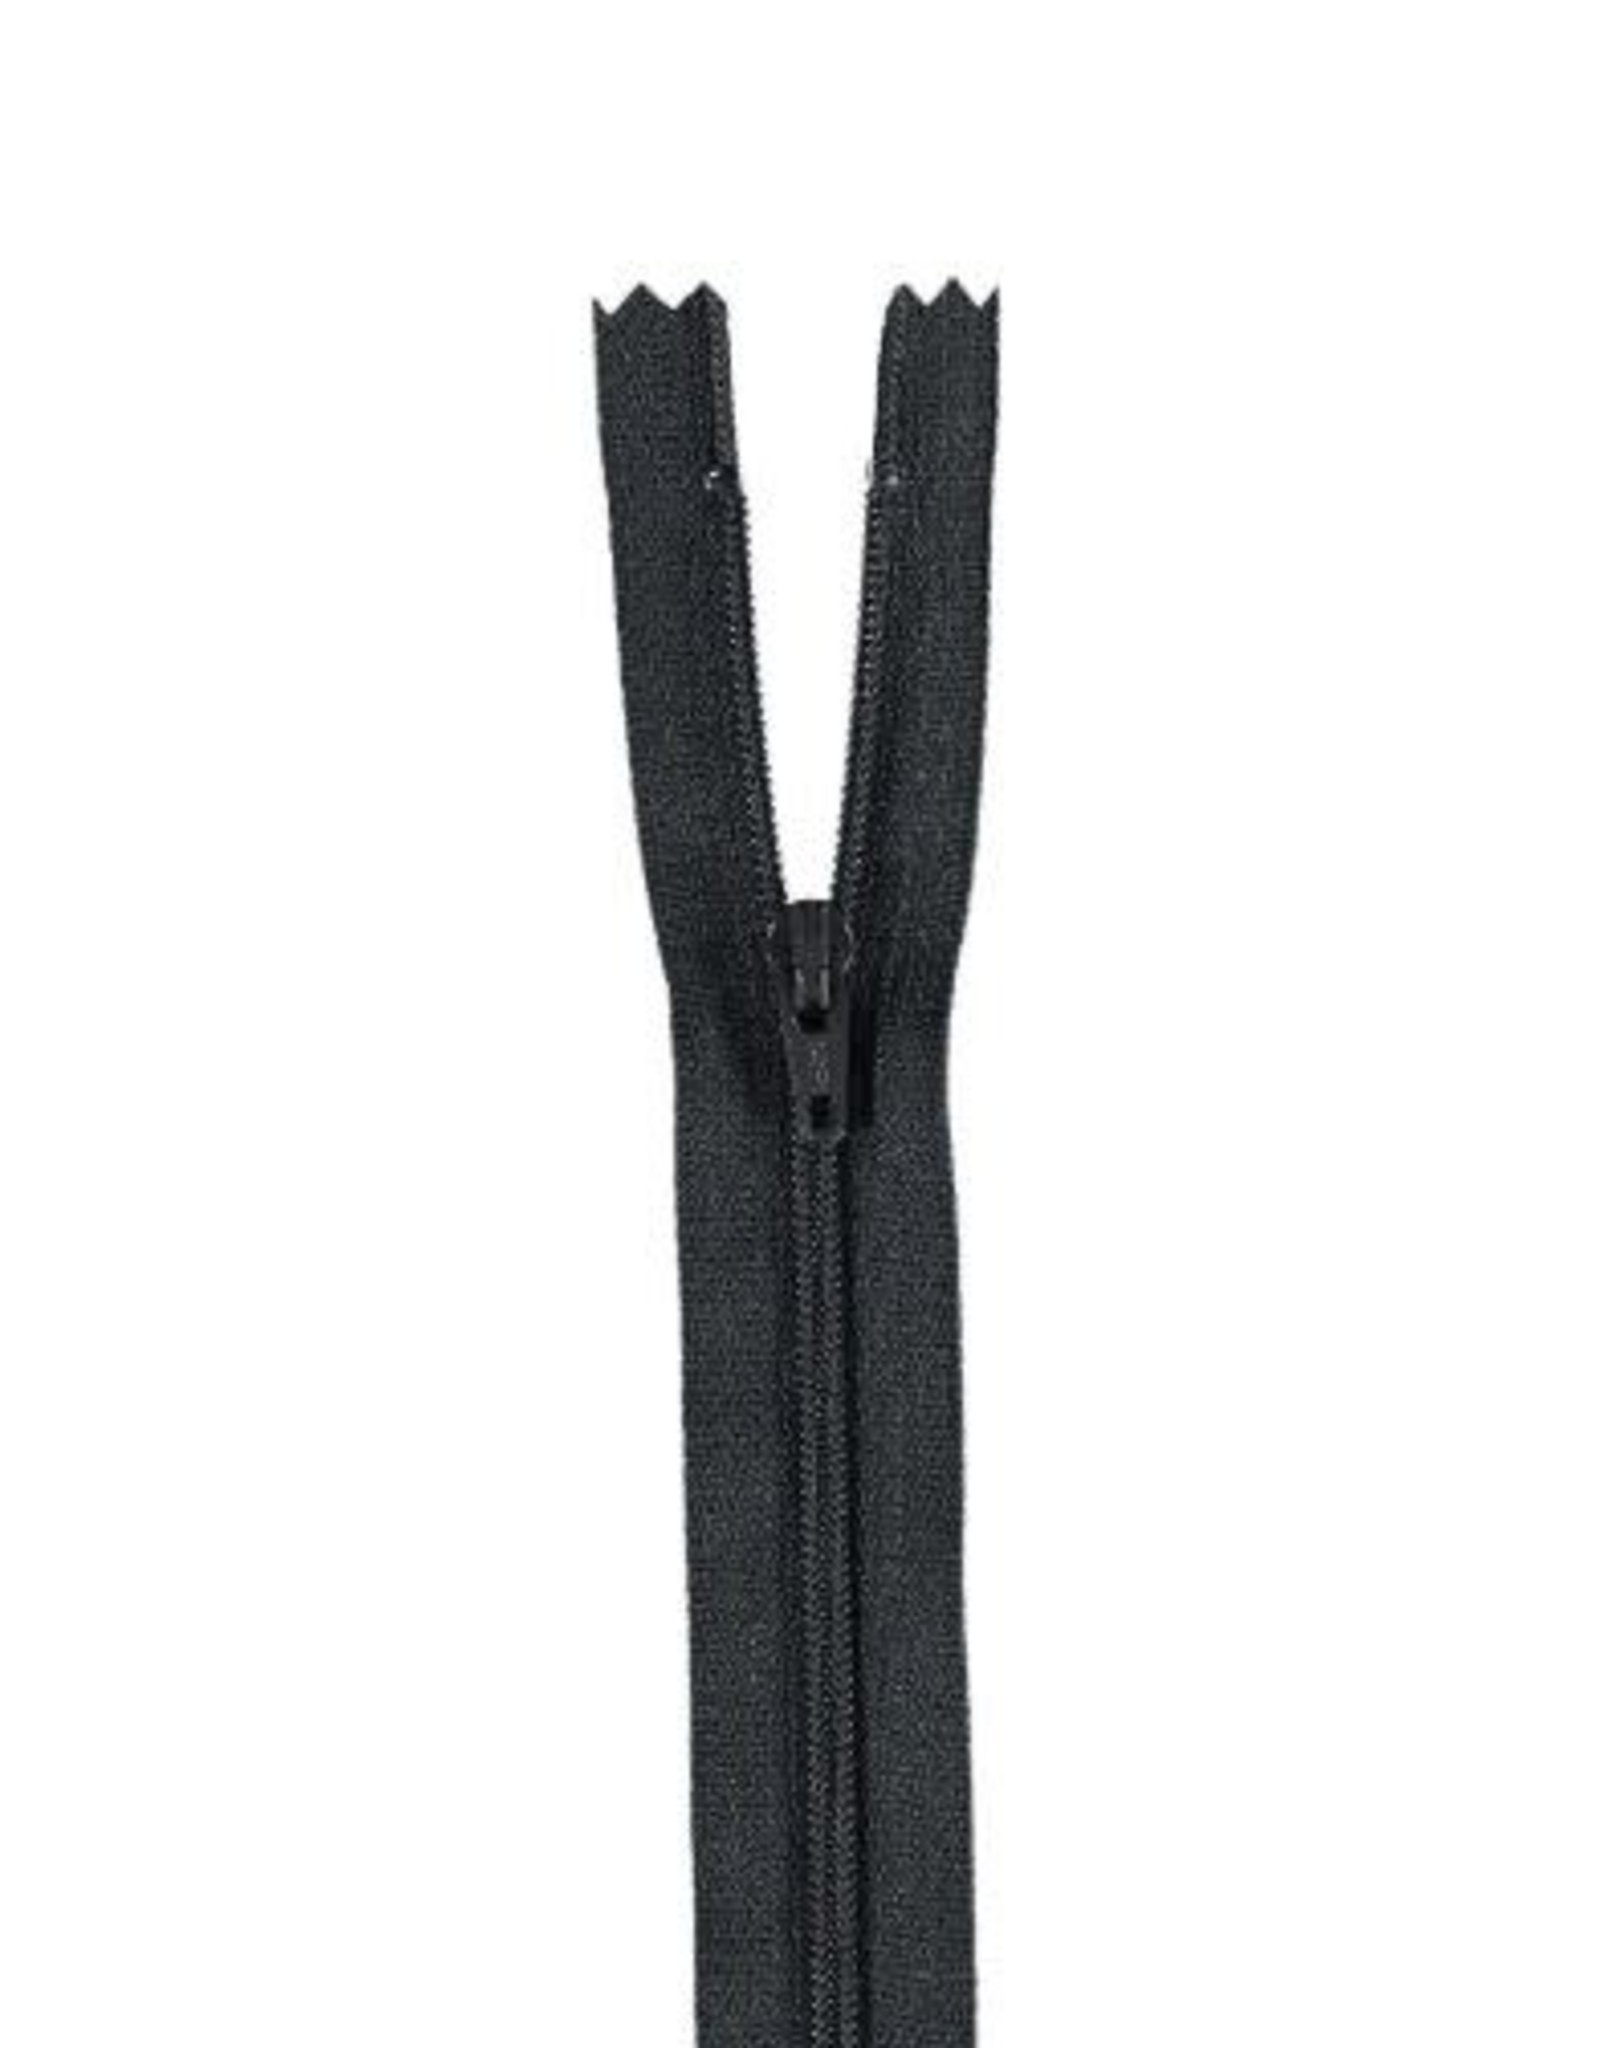 YKK Spiraalrits niet-DB 3mm antraciet 156-20cm